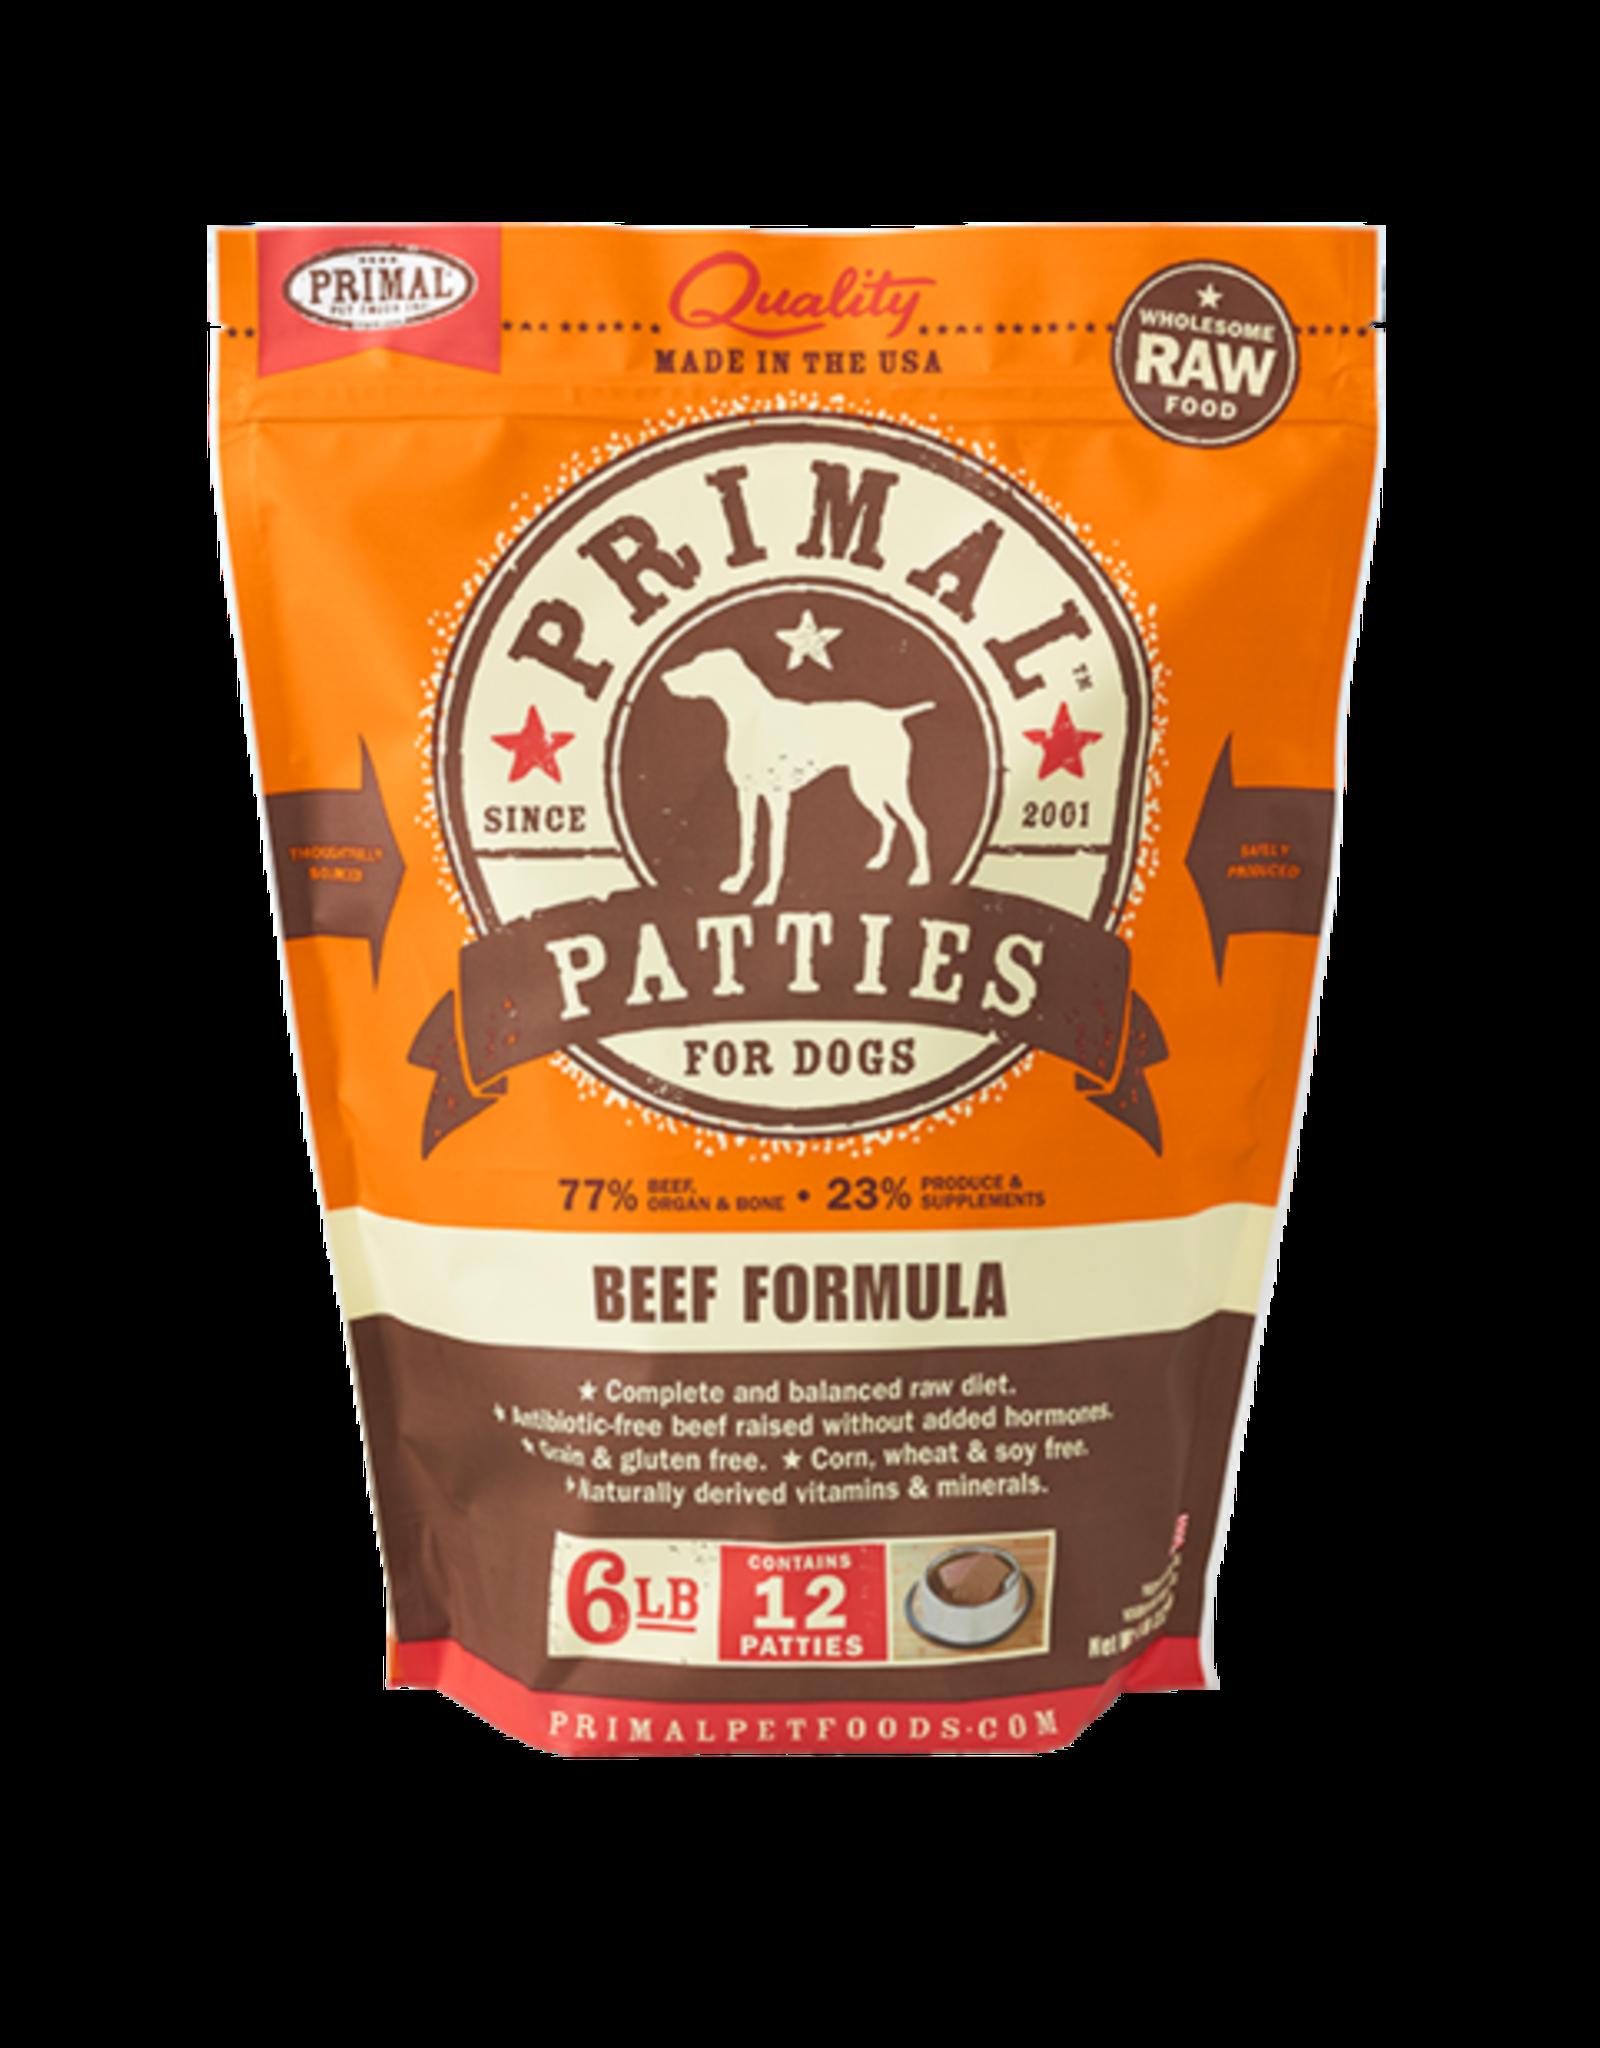 Primal Primal Frozen Canine Patties 6 lb